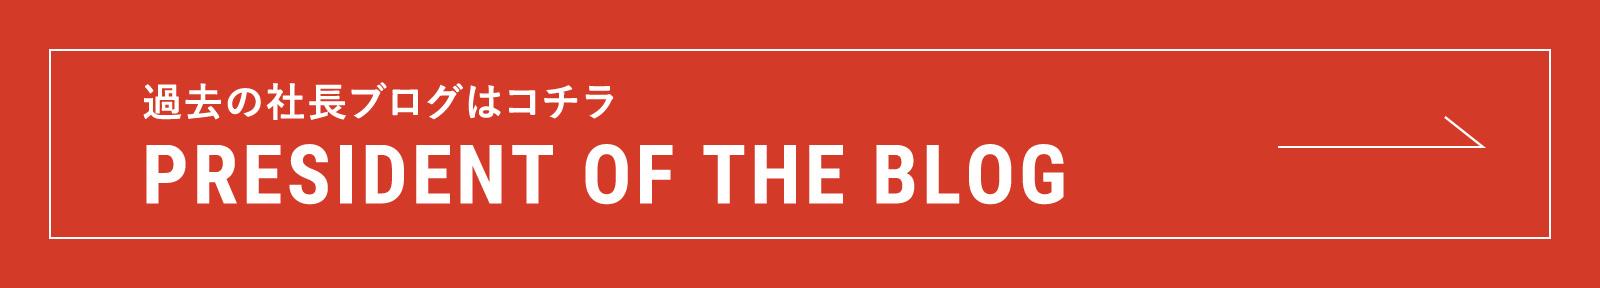 PRESIDENT OF THE BLOG 過去の社長ブログはコチラ